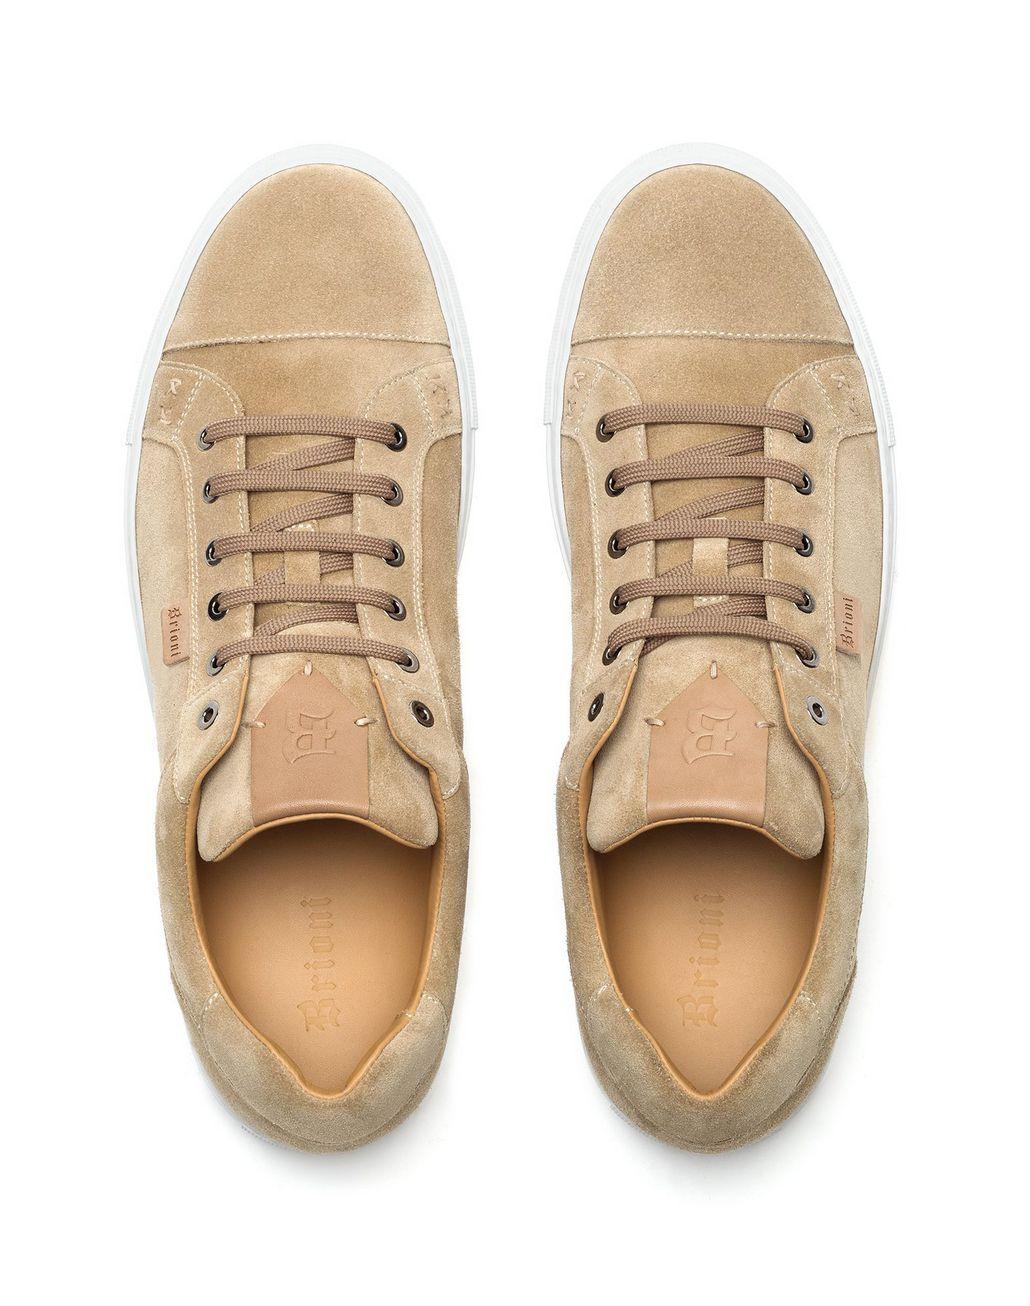 BRIONI Sneakers Beige in Pelle Scamosciata Sneaker U r